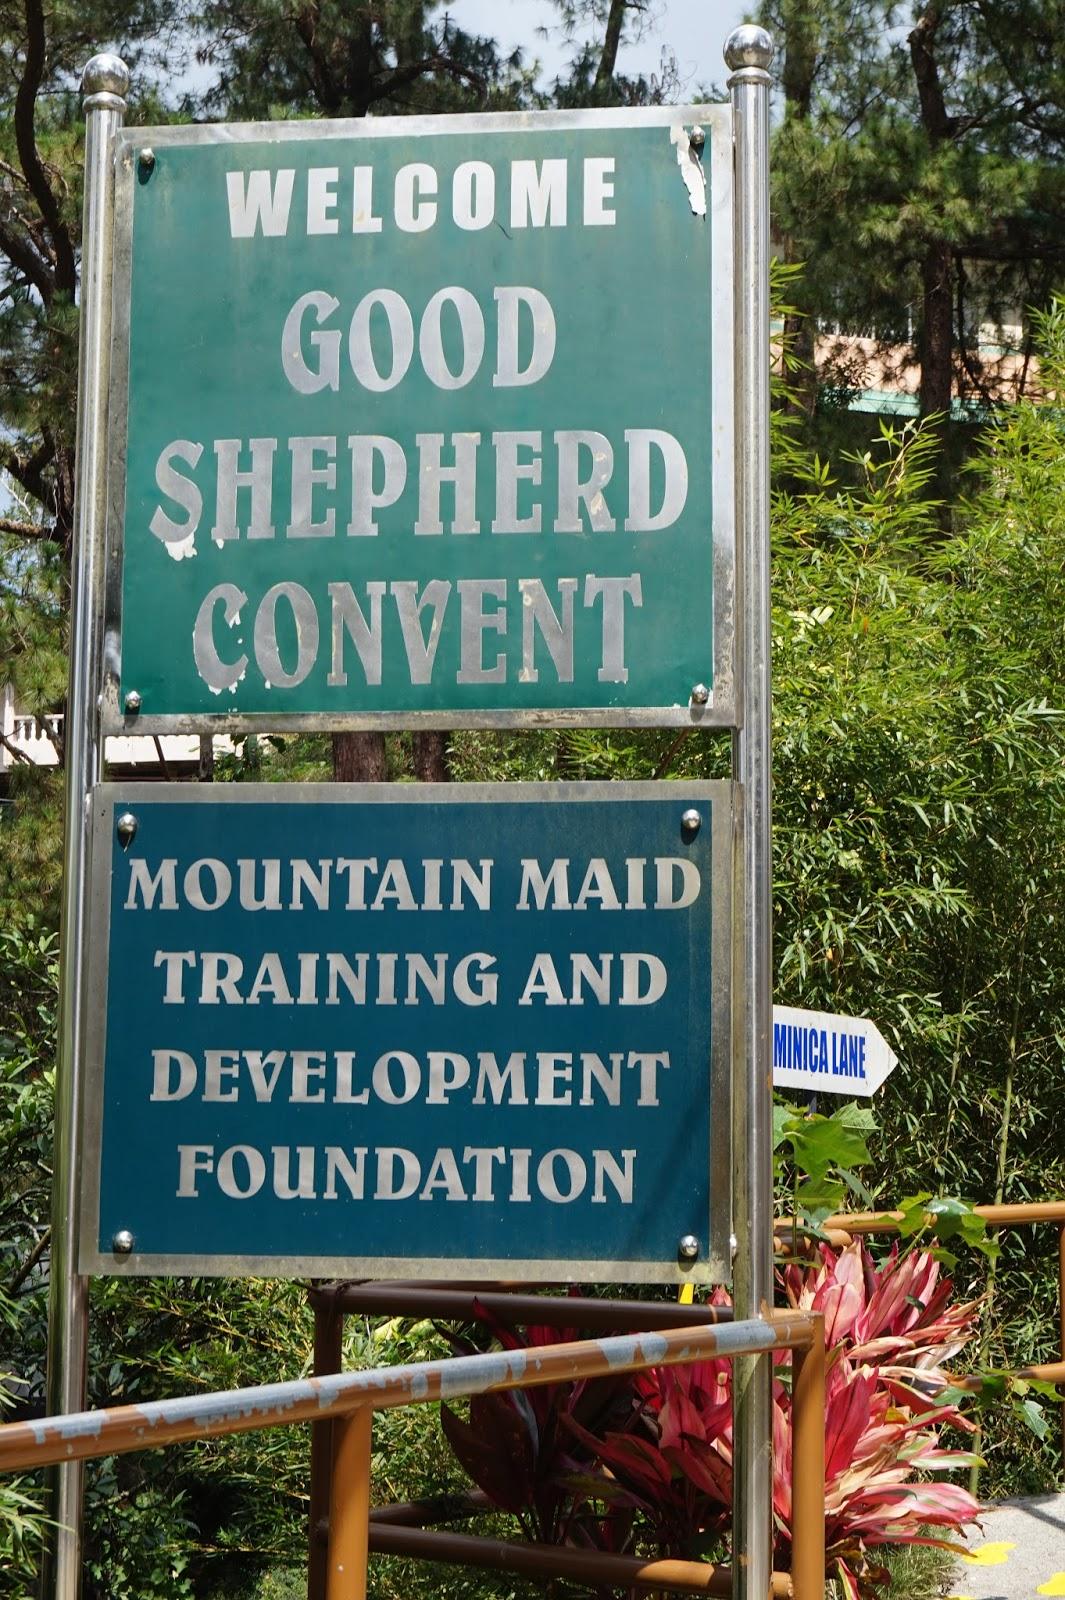 Good Shepherd Convent